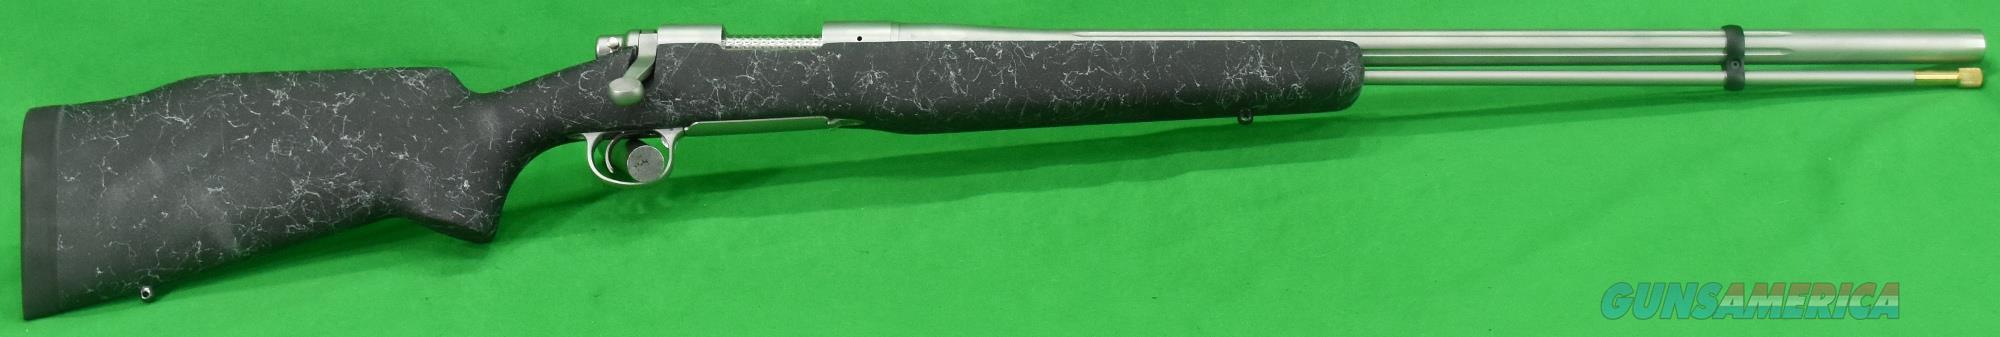 700 Ultimate SS BC Composite 50 Cal 26In 86960  Guns > Rifles > Remington Rifles - Modern > Model 700 > Sporting